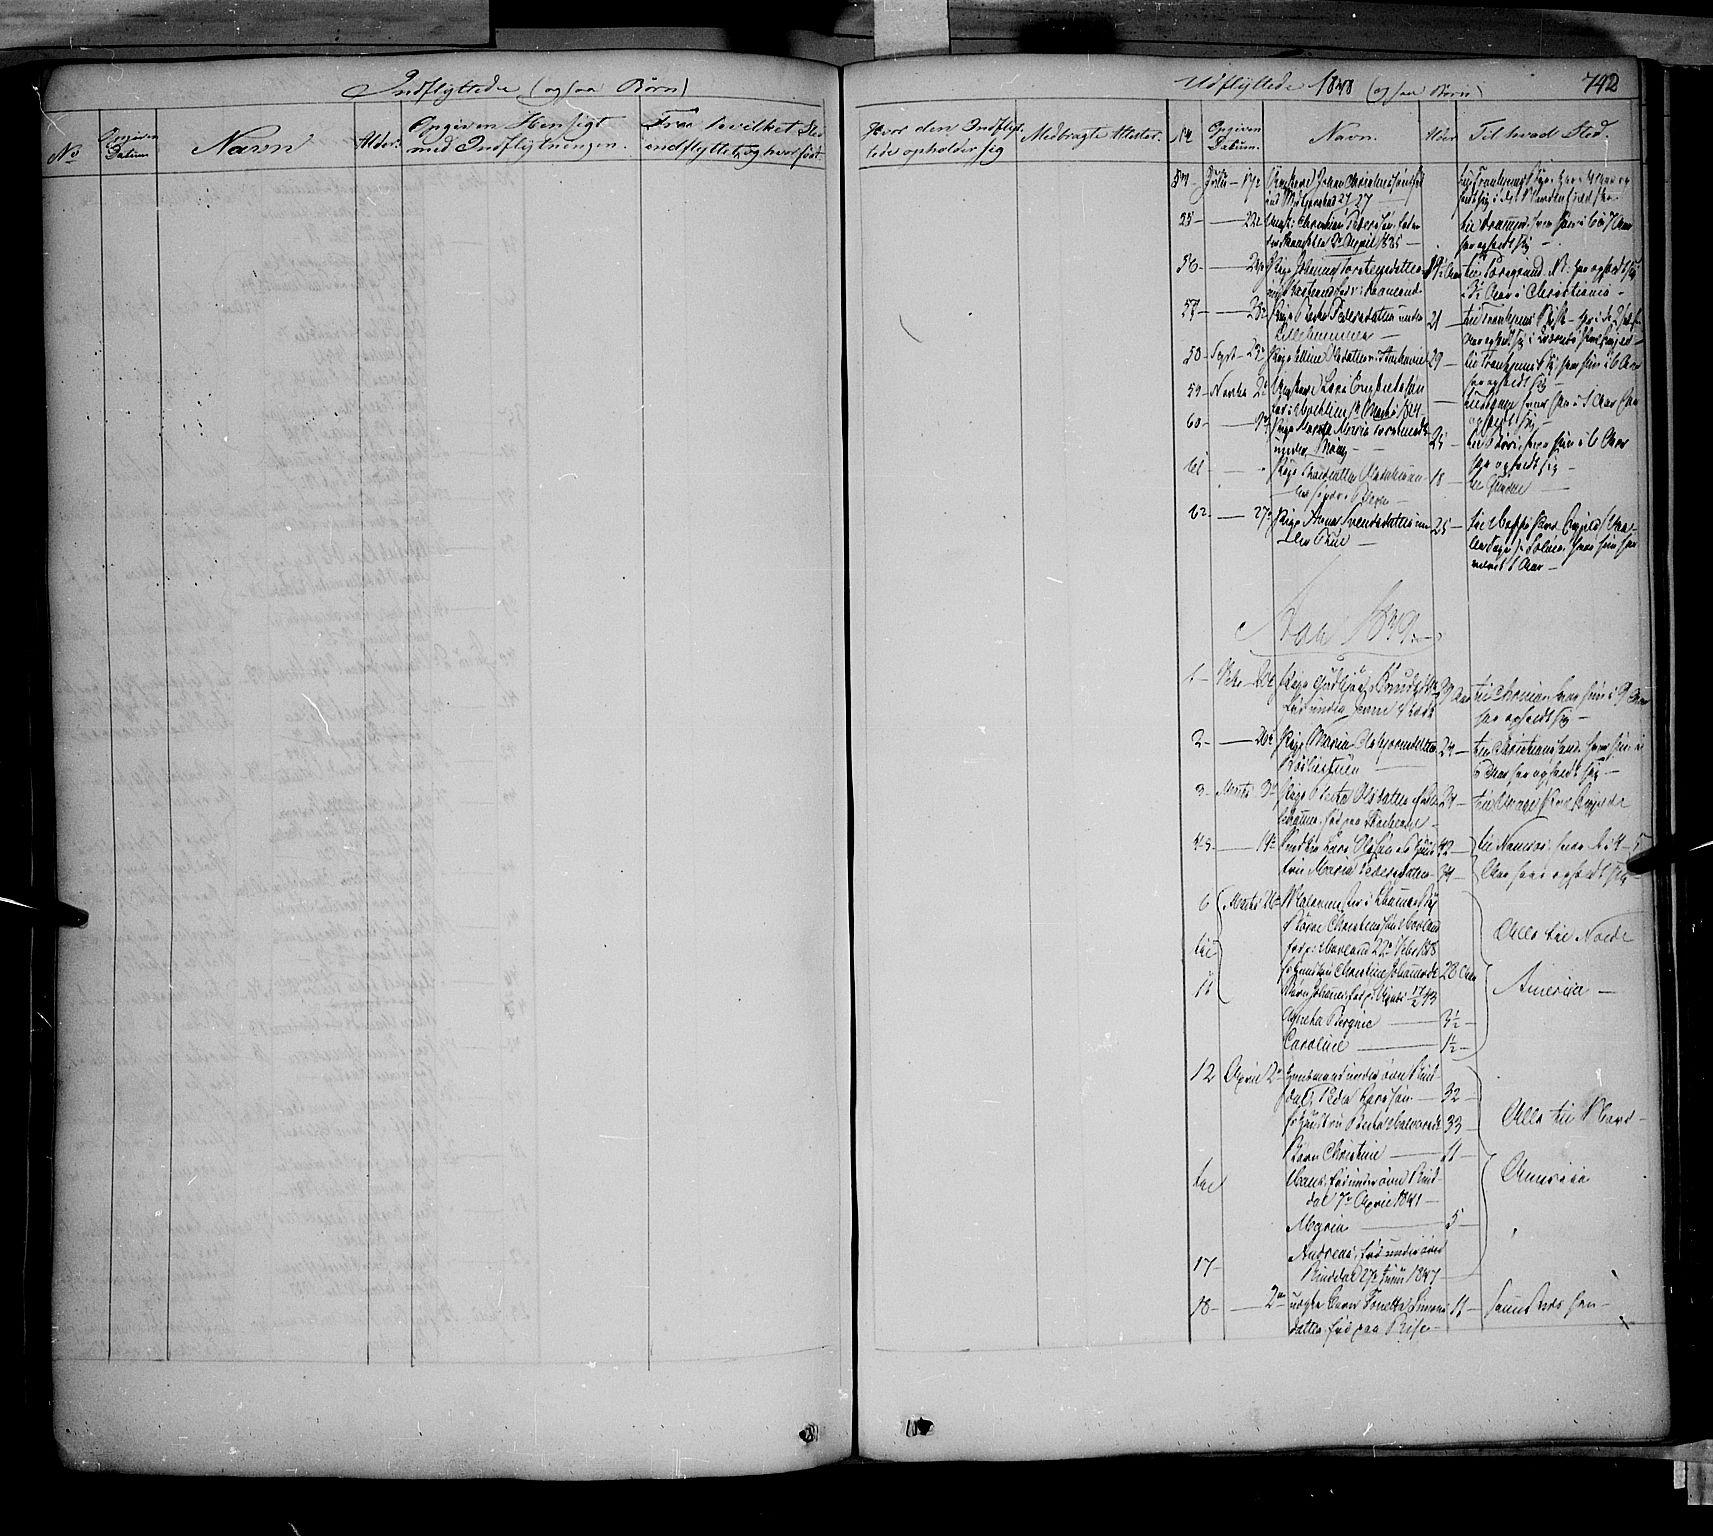 SAH, Fåberg prestekontor, Ministerialbok nr. 5, 1836-1854, s. 741-742